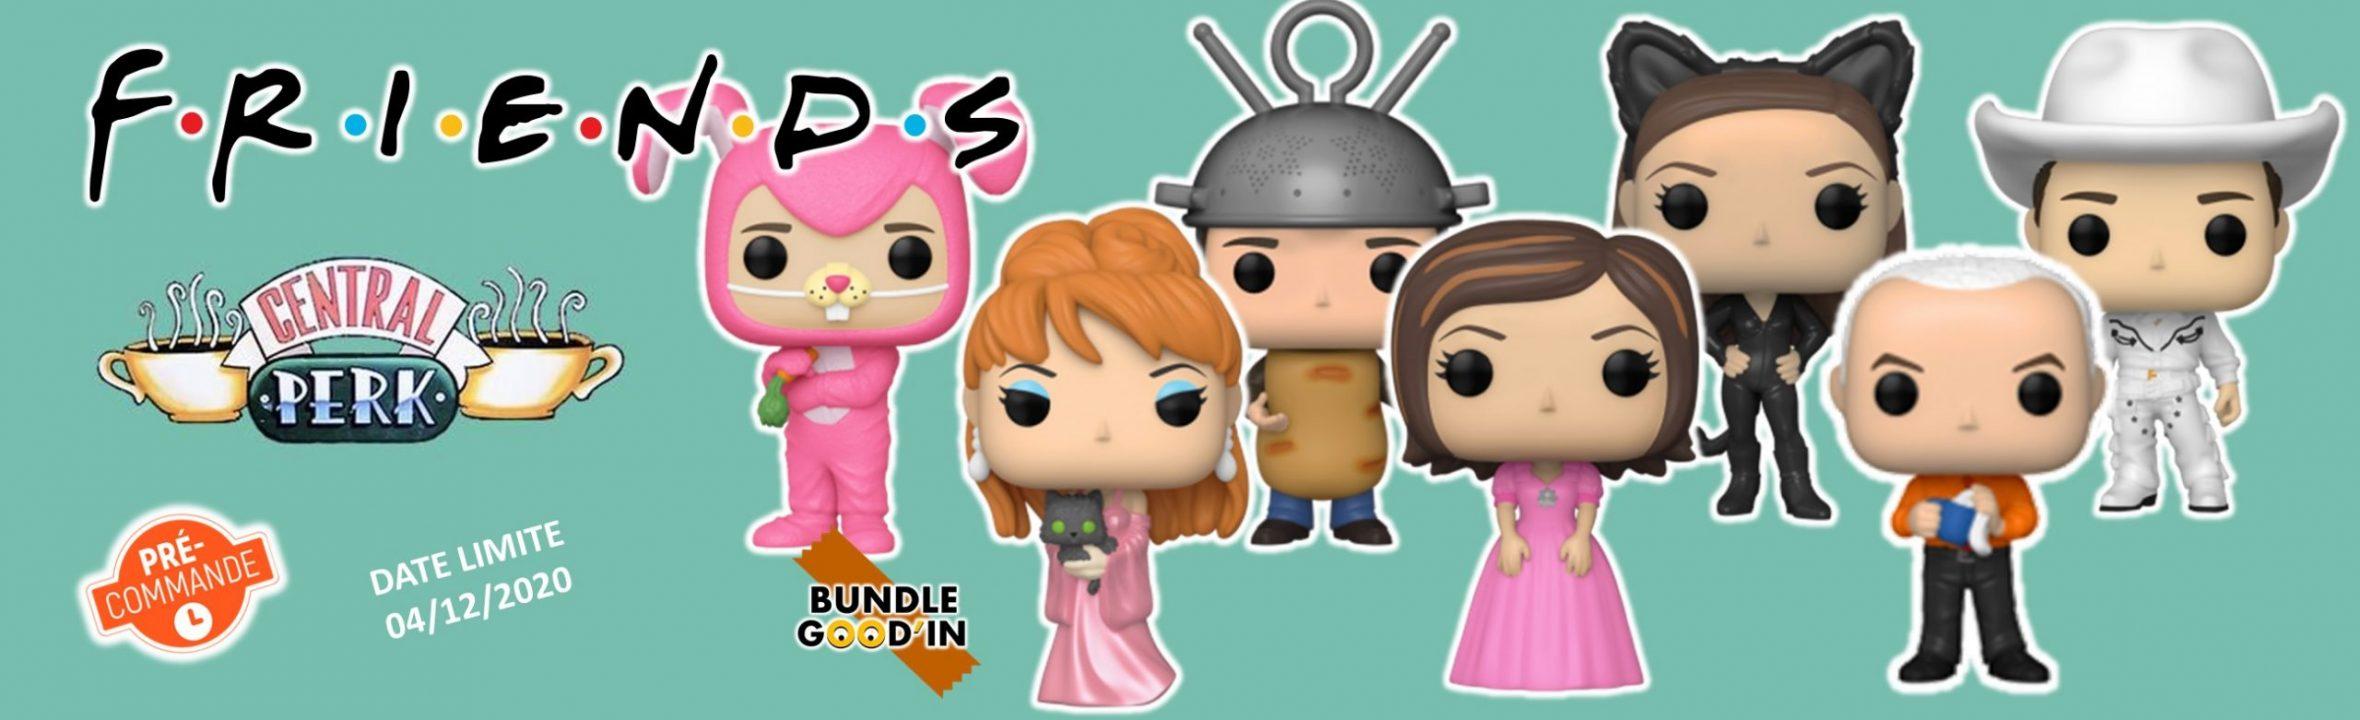 funko pop Friends 2020 goodin shop